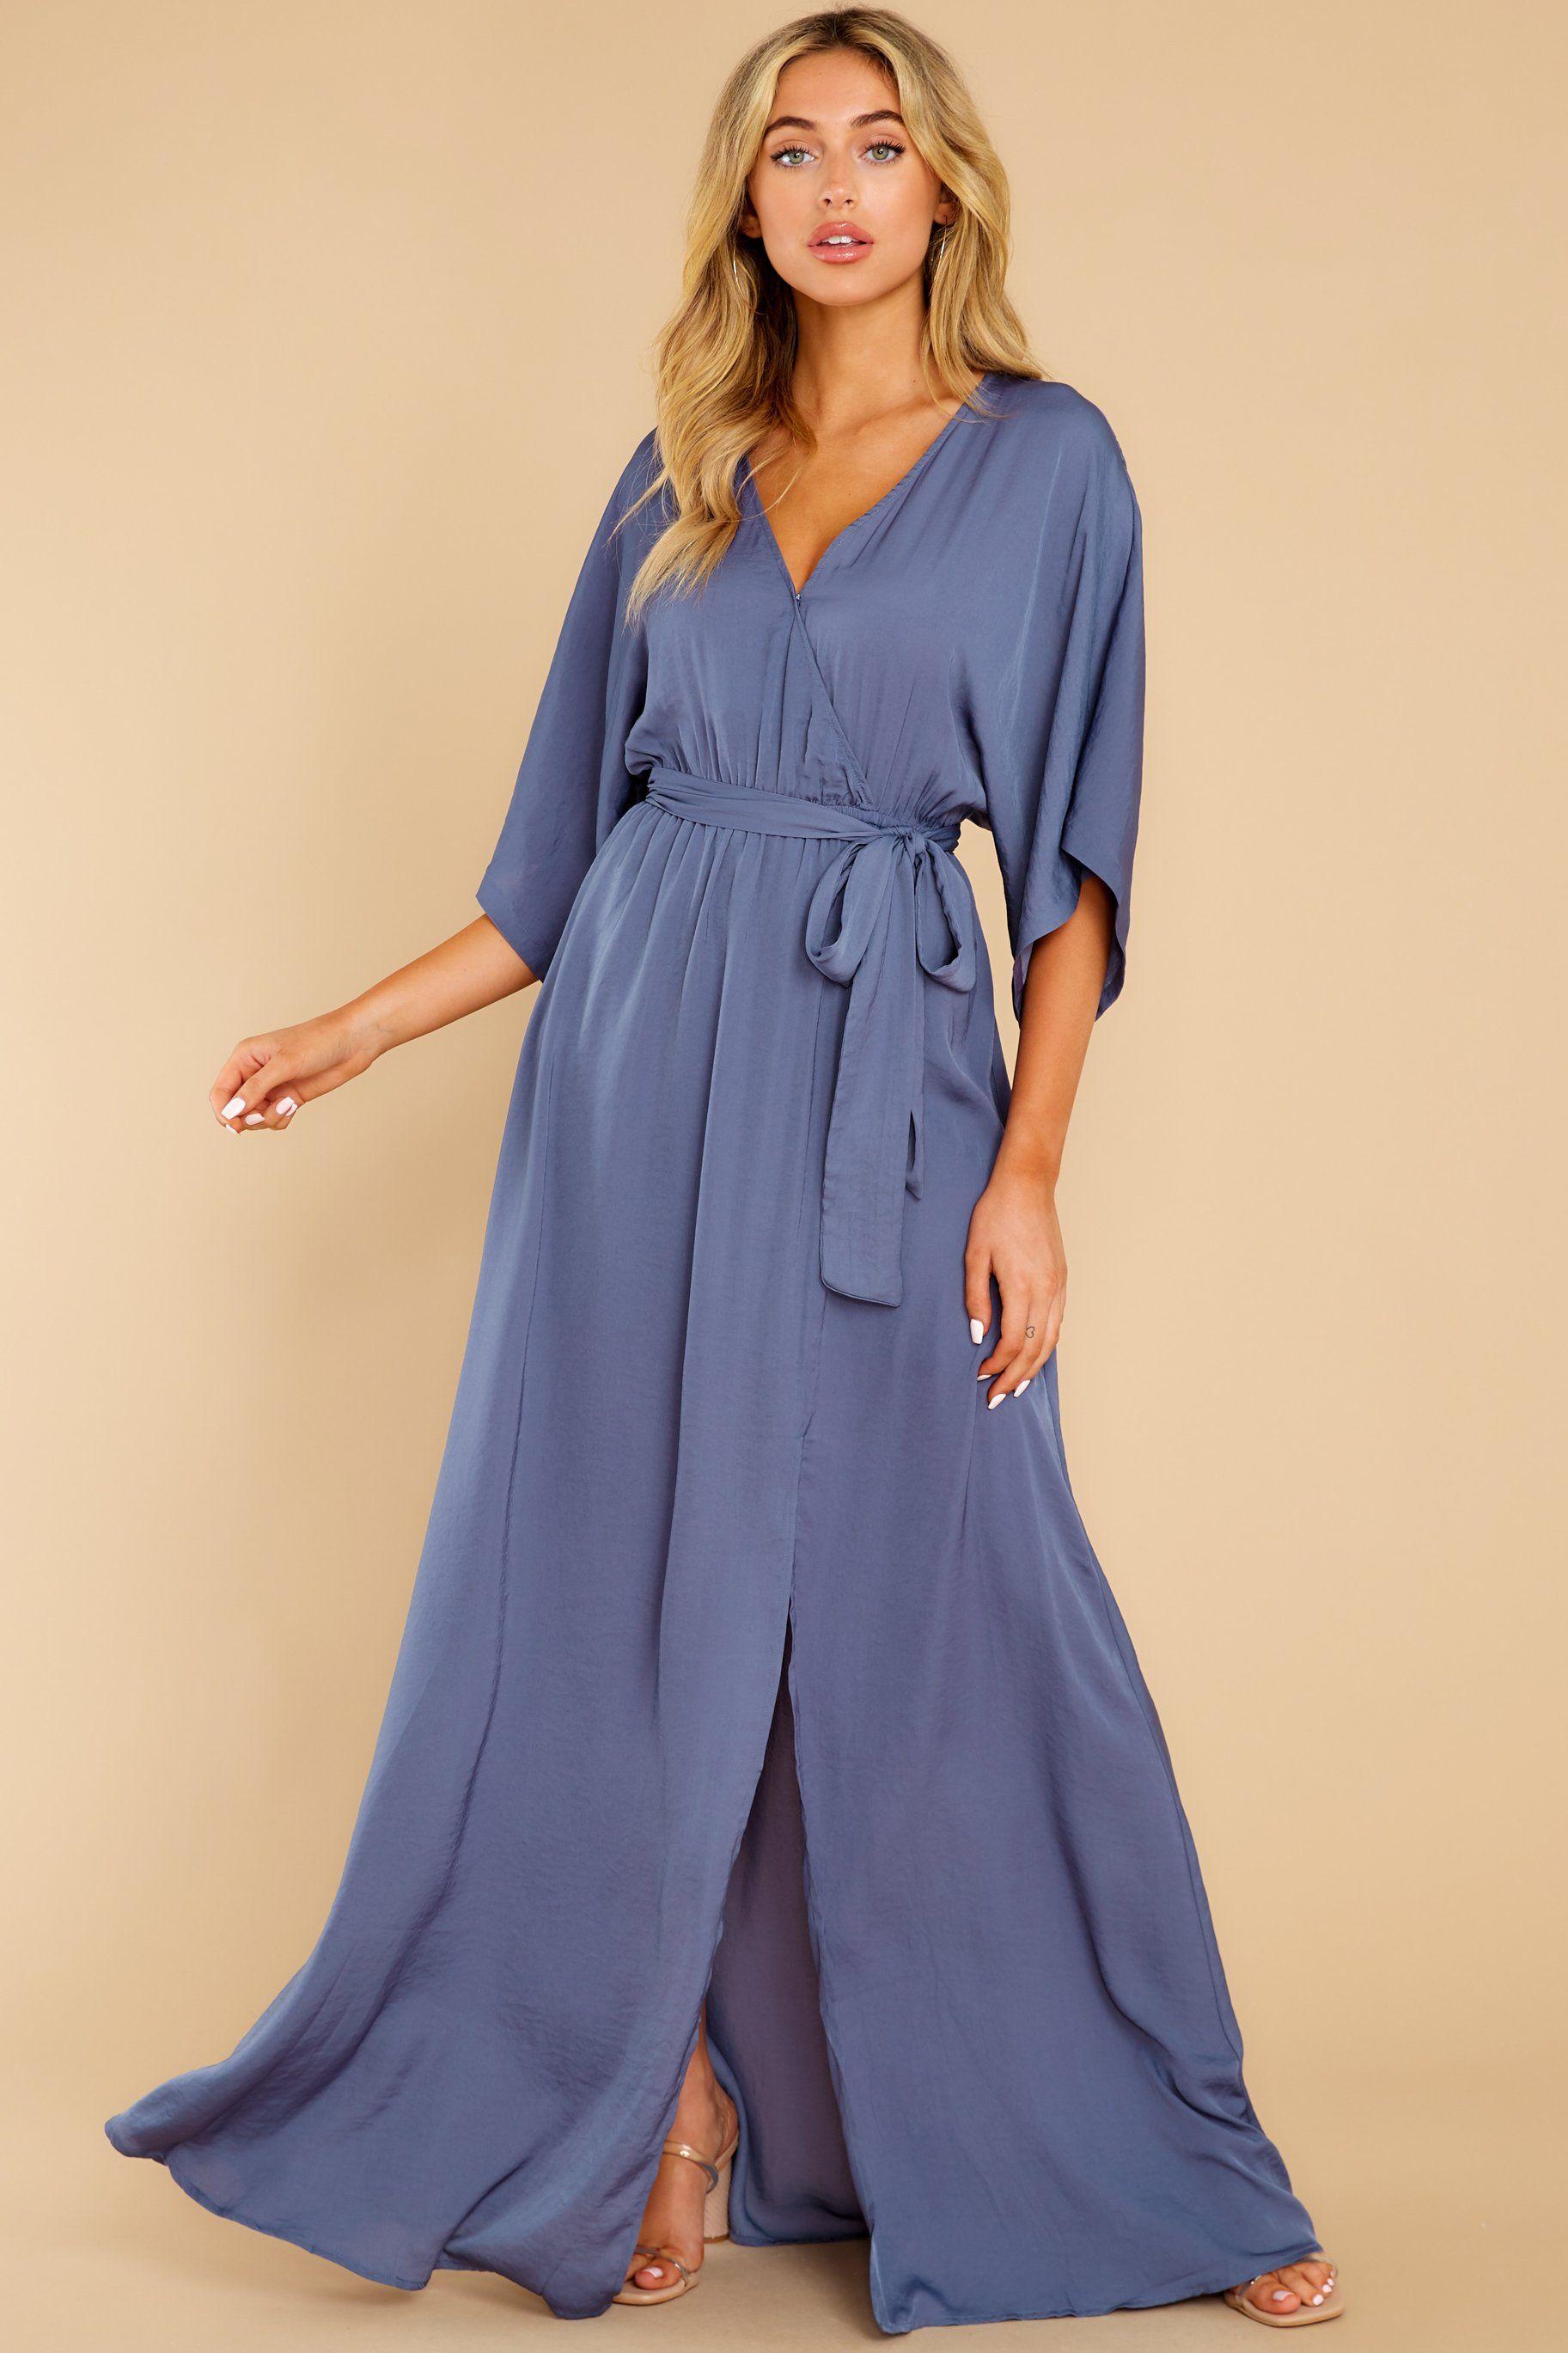 Stylish Blue Dress Belted Surplice Maxi Dress Dress 49 00 Maxi Dress Red Dress Boutique Chic Maxi Dresses [ 2738 x 1825 Pixel ]